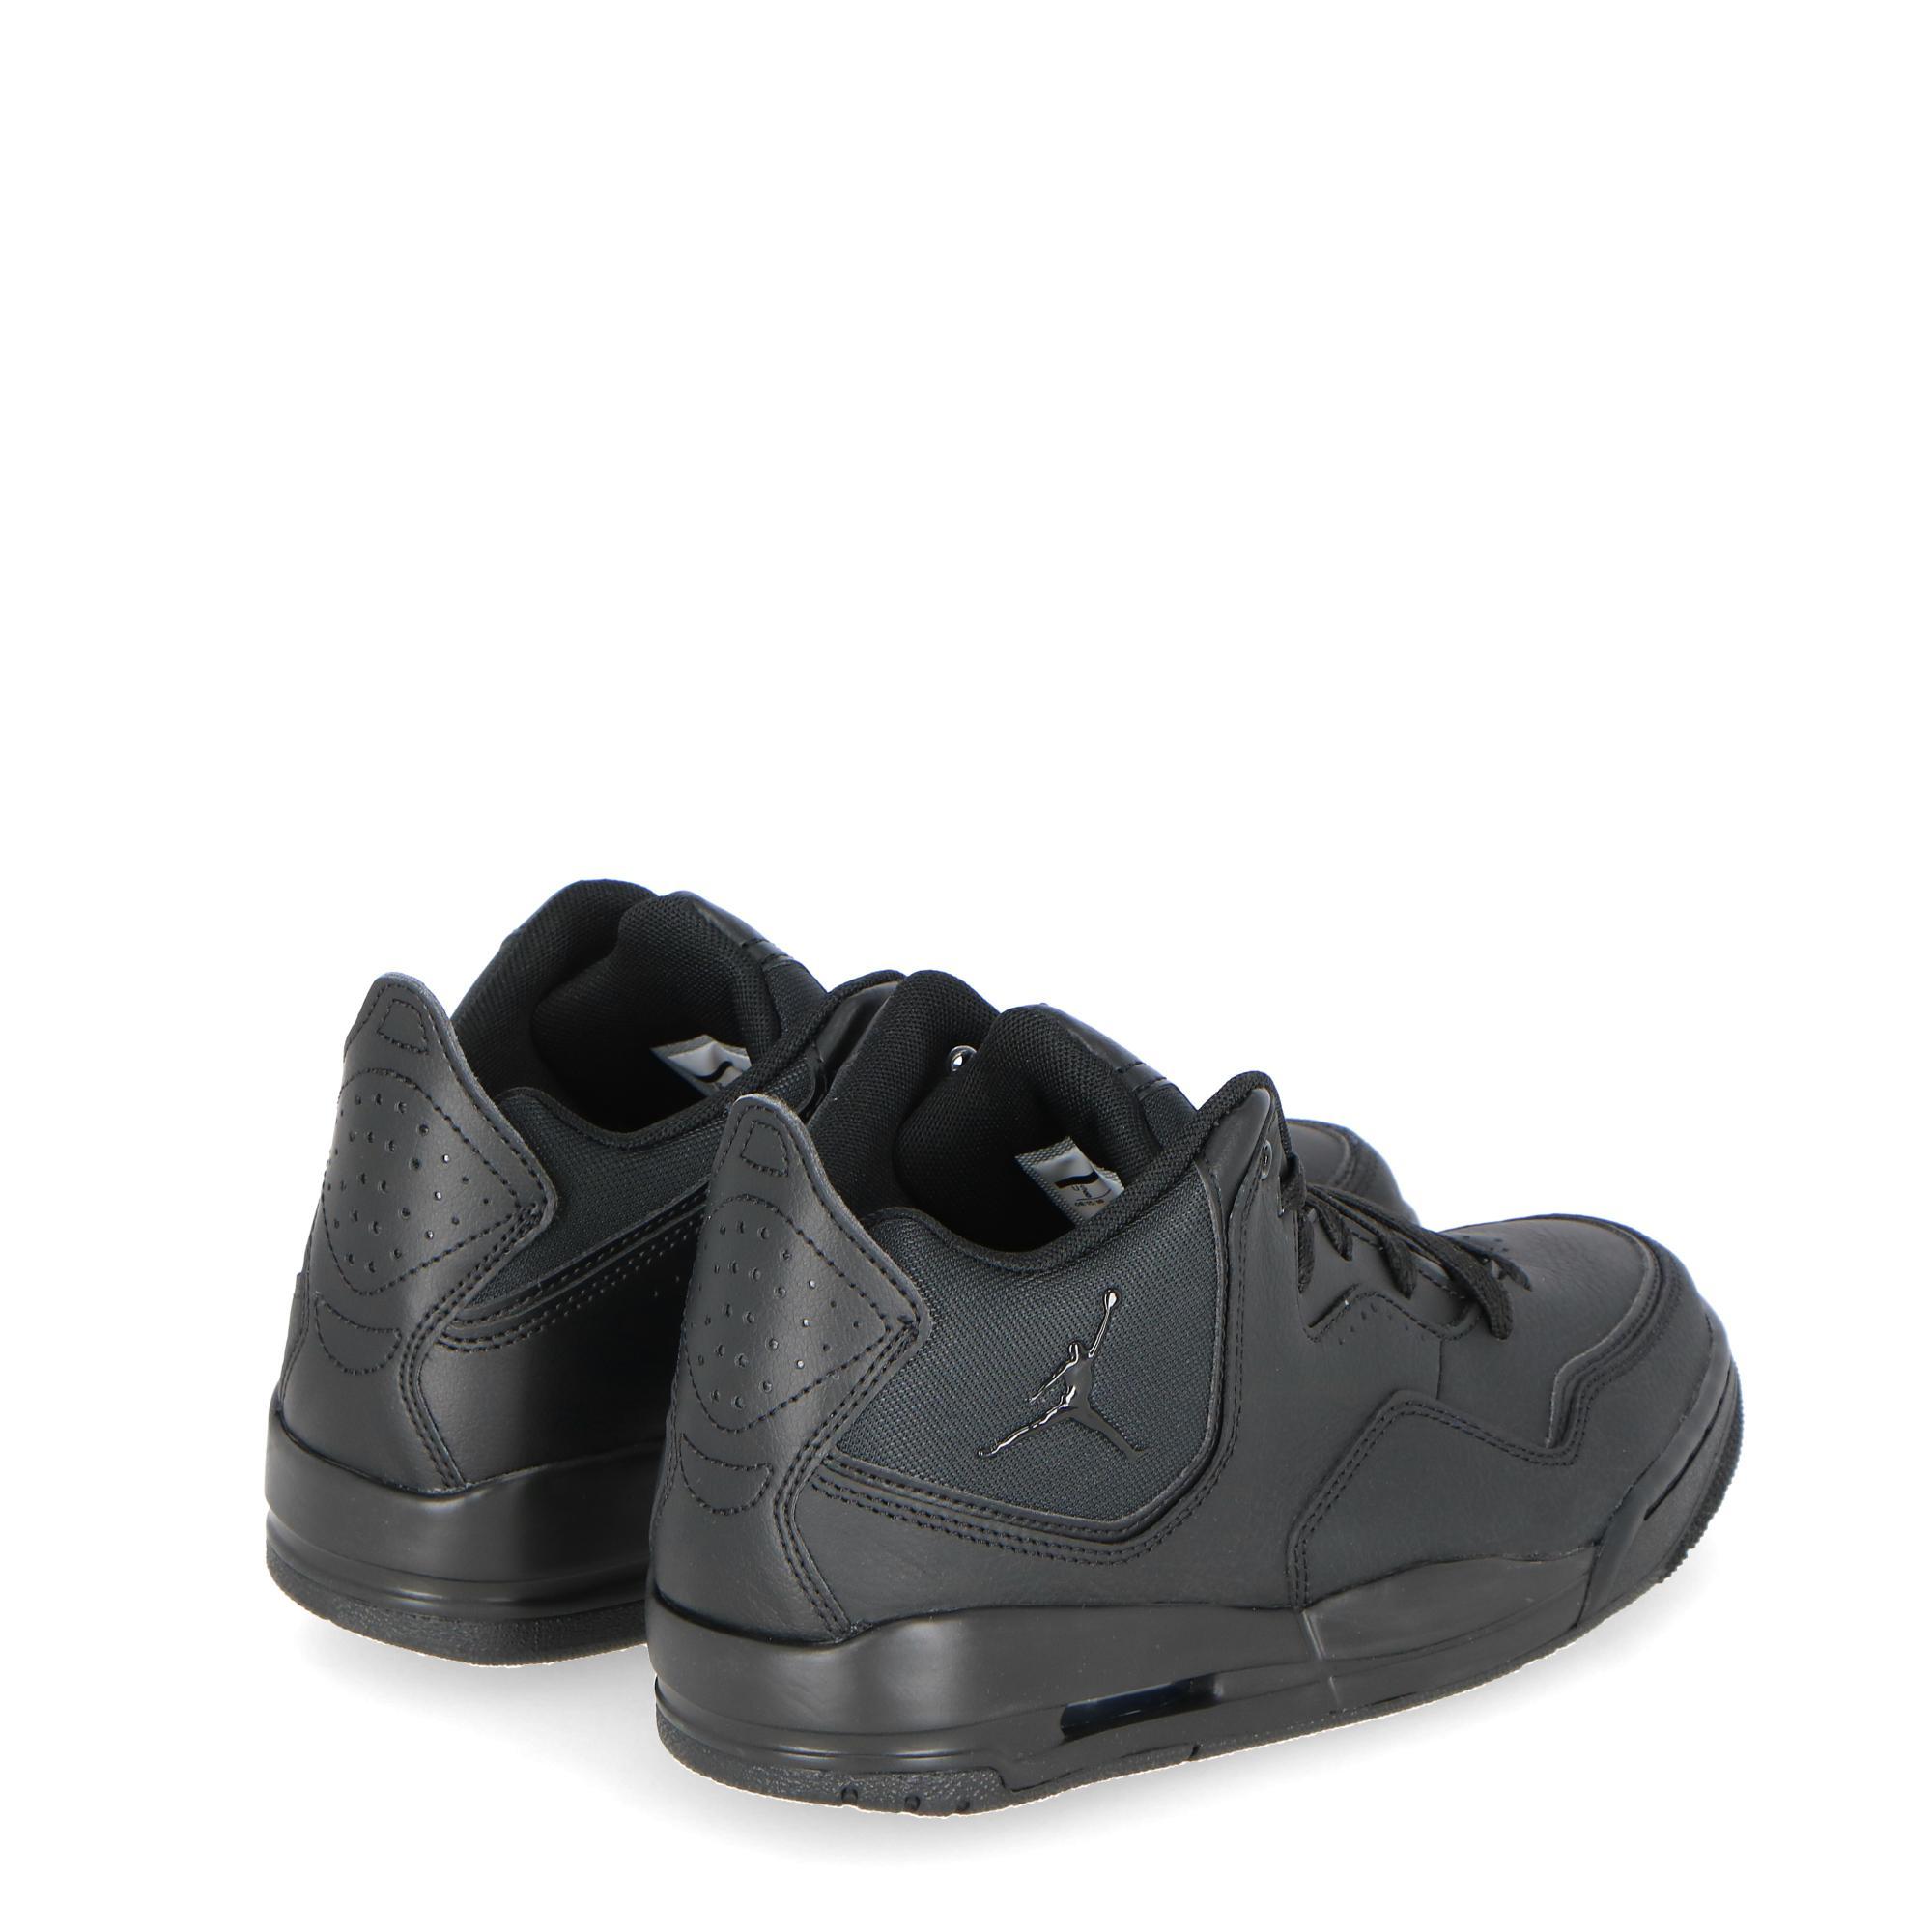 sale retailer 7bf84 8df14 Jordan Courtside 23 Black black